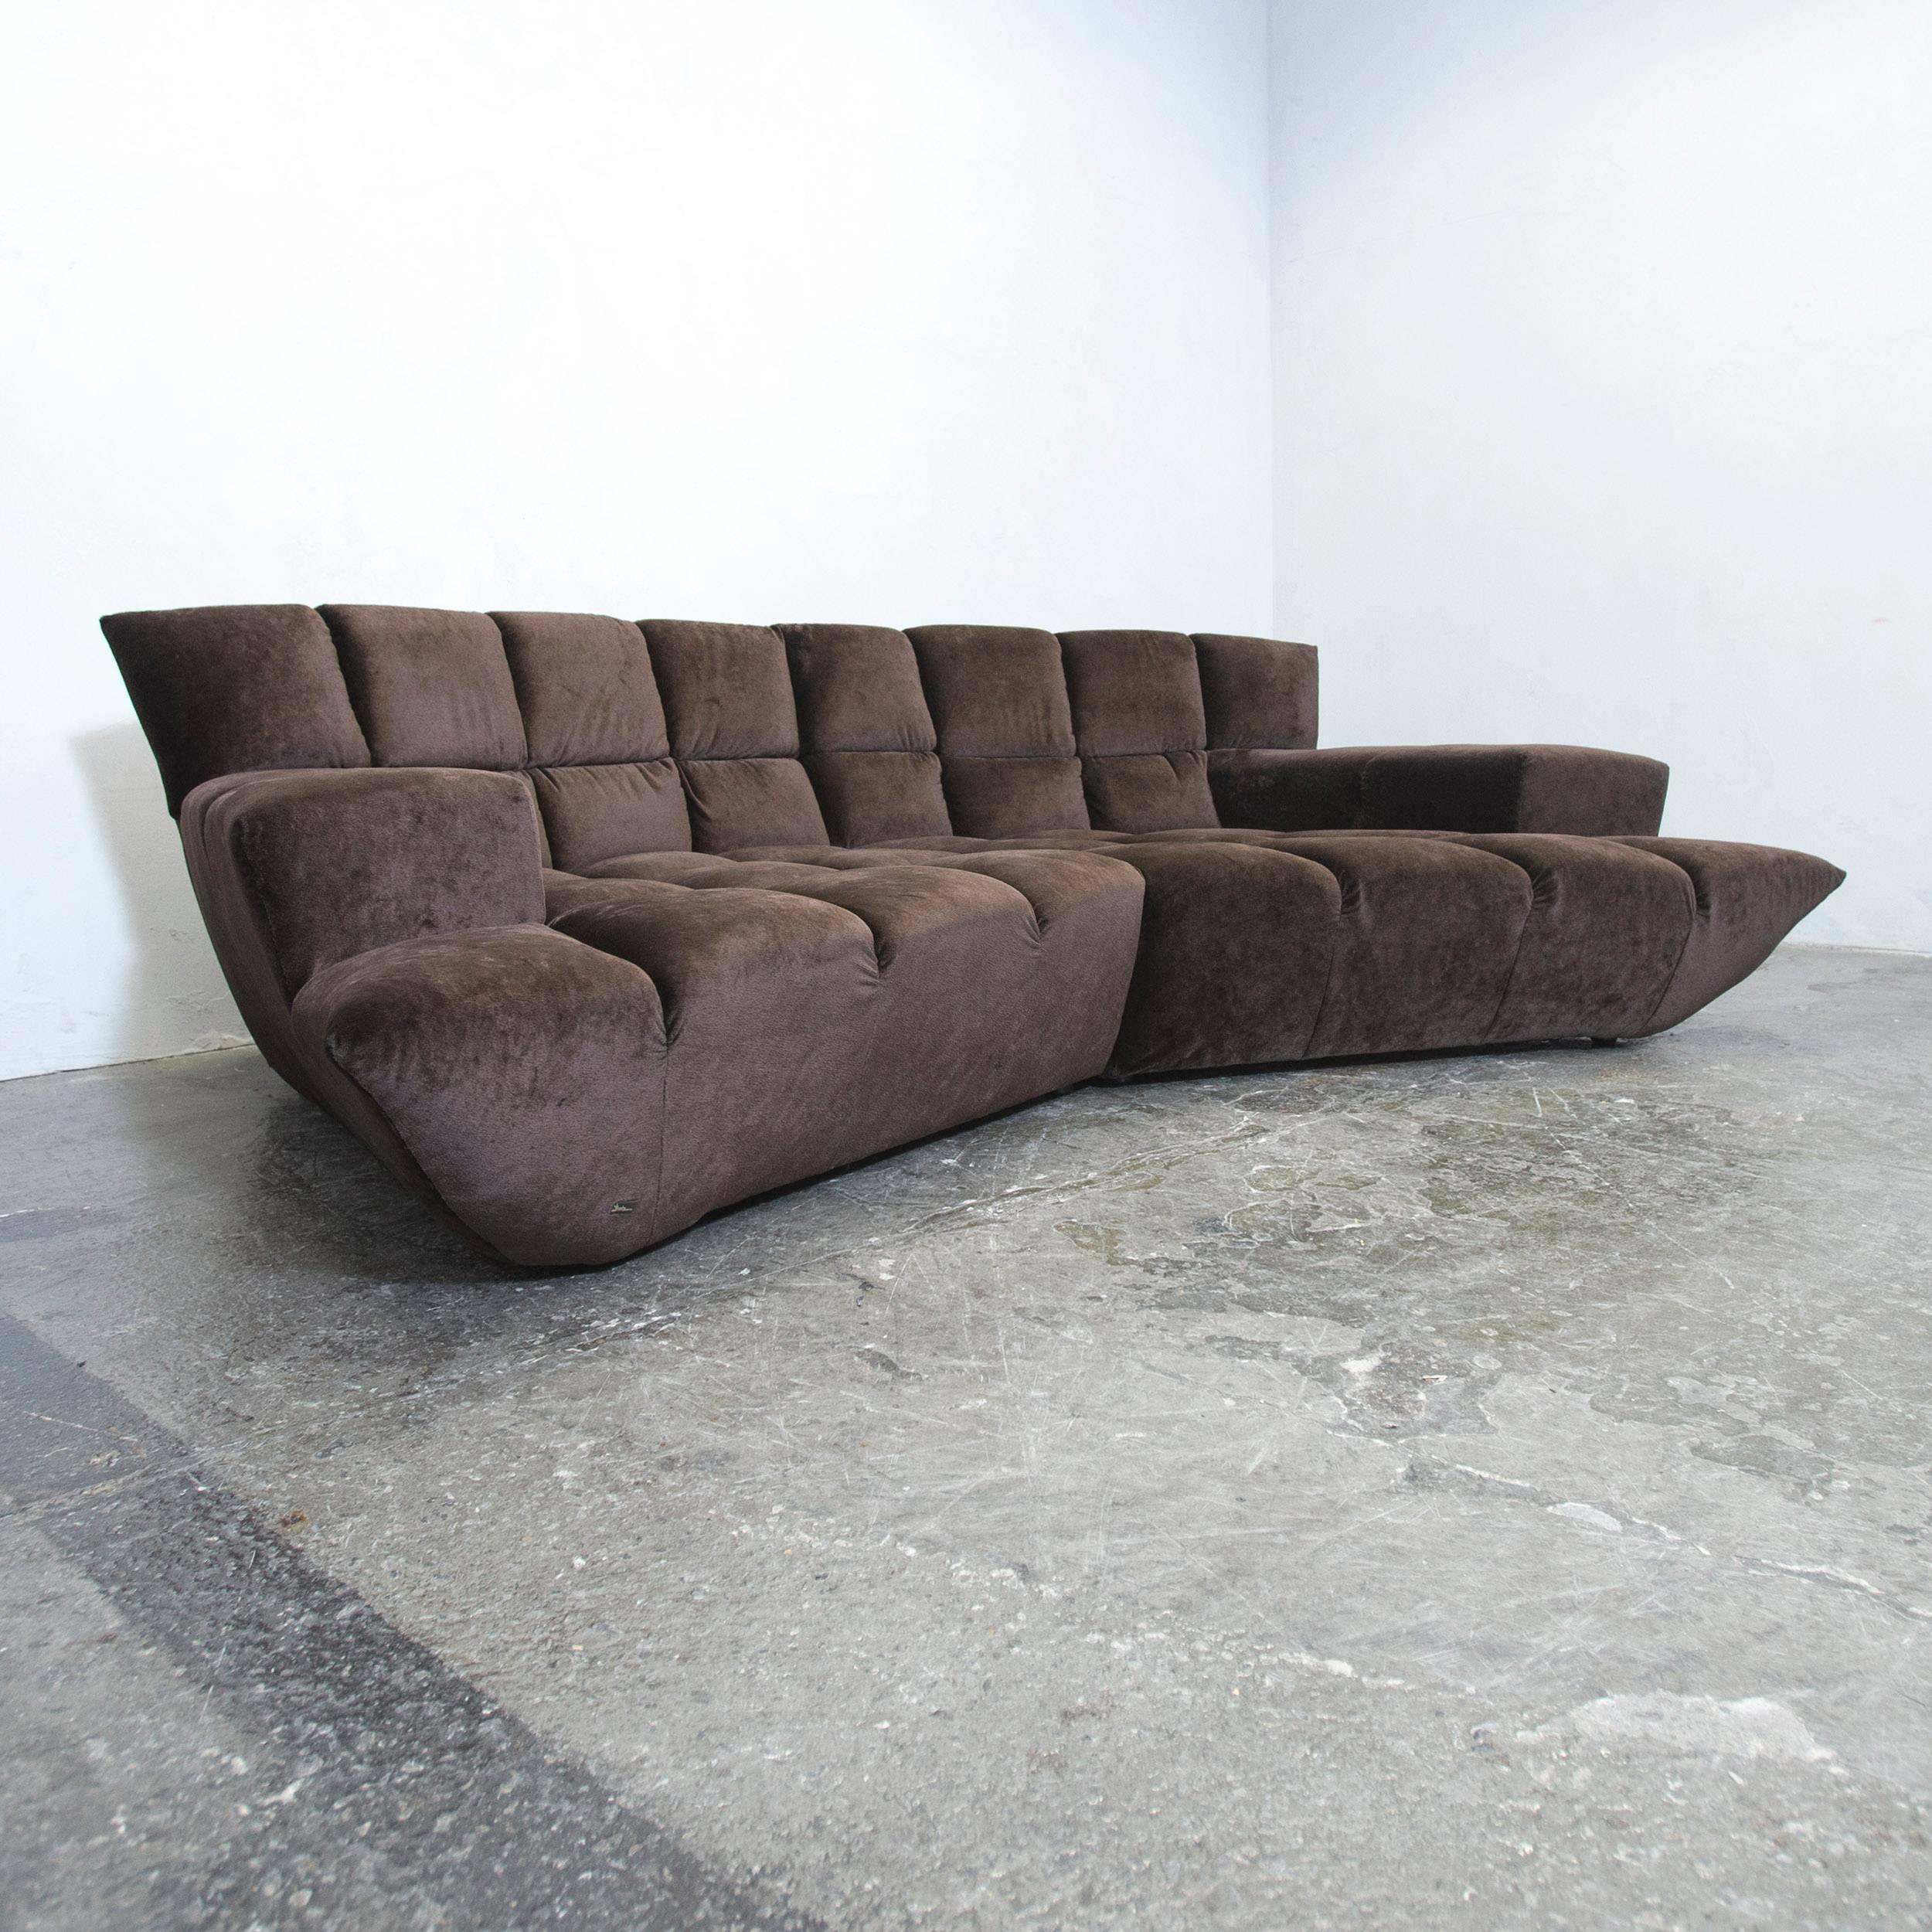 Bretz Cloud 7 Designer Cornersofa Brown Velvet Couch Modern 3